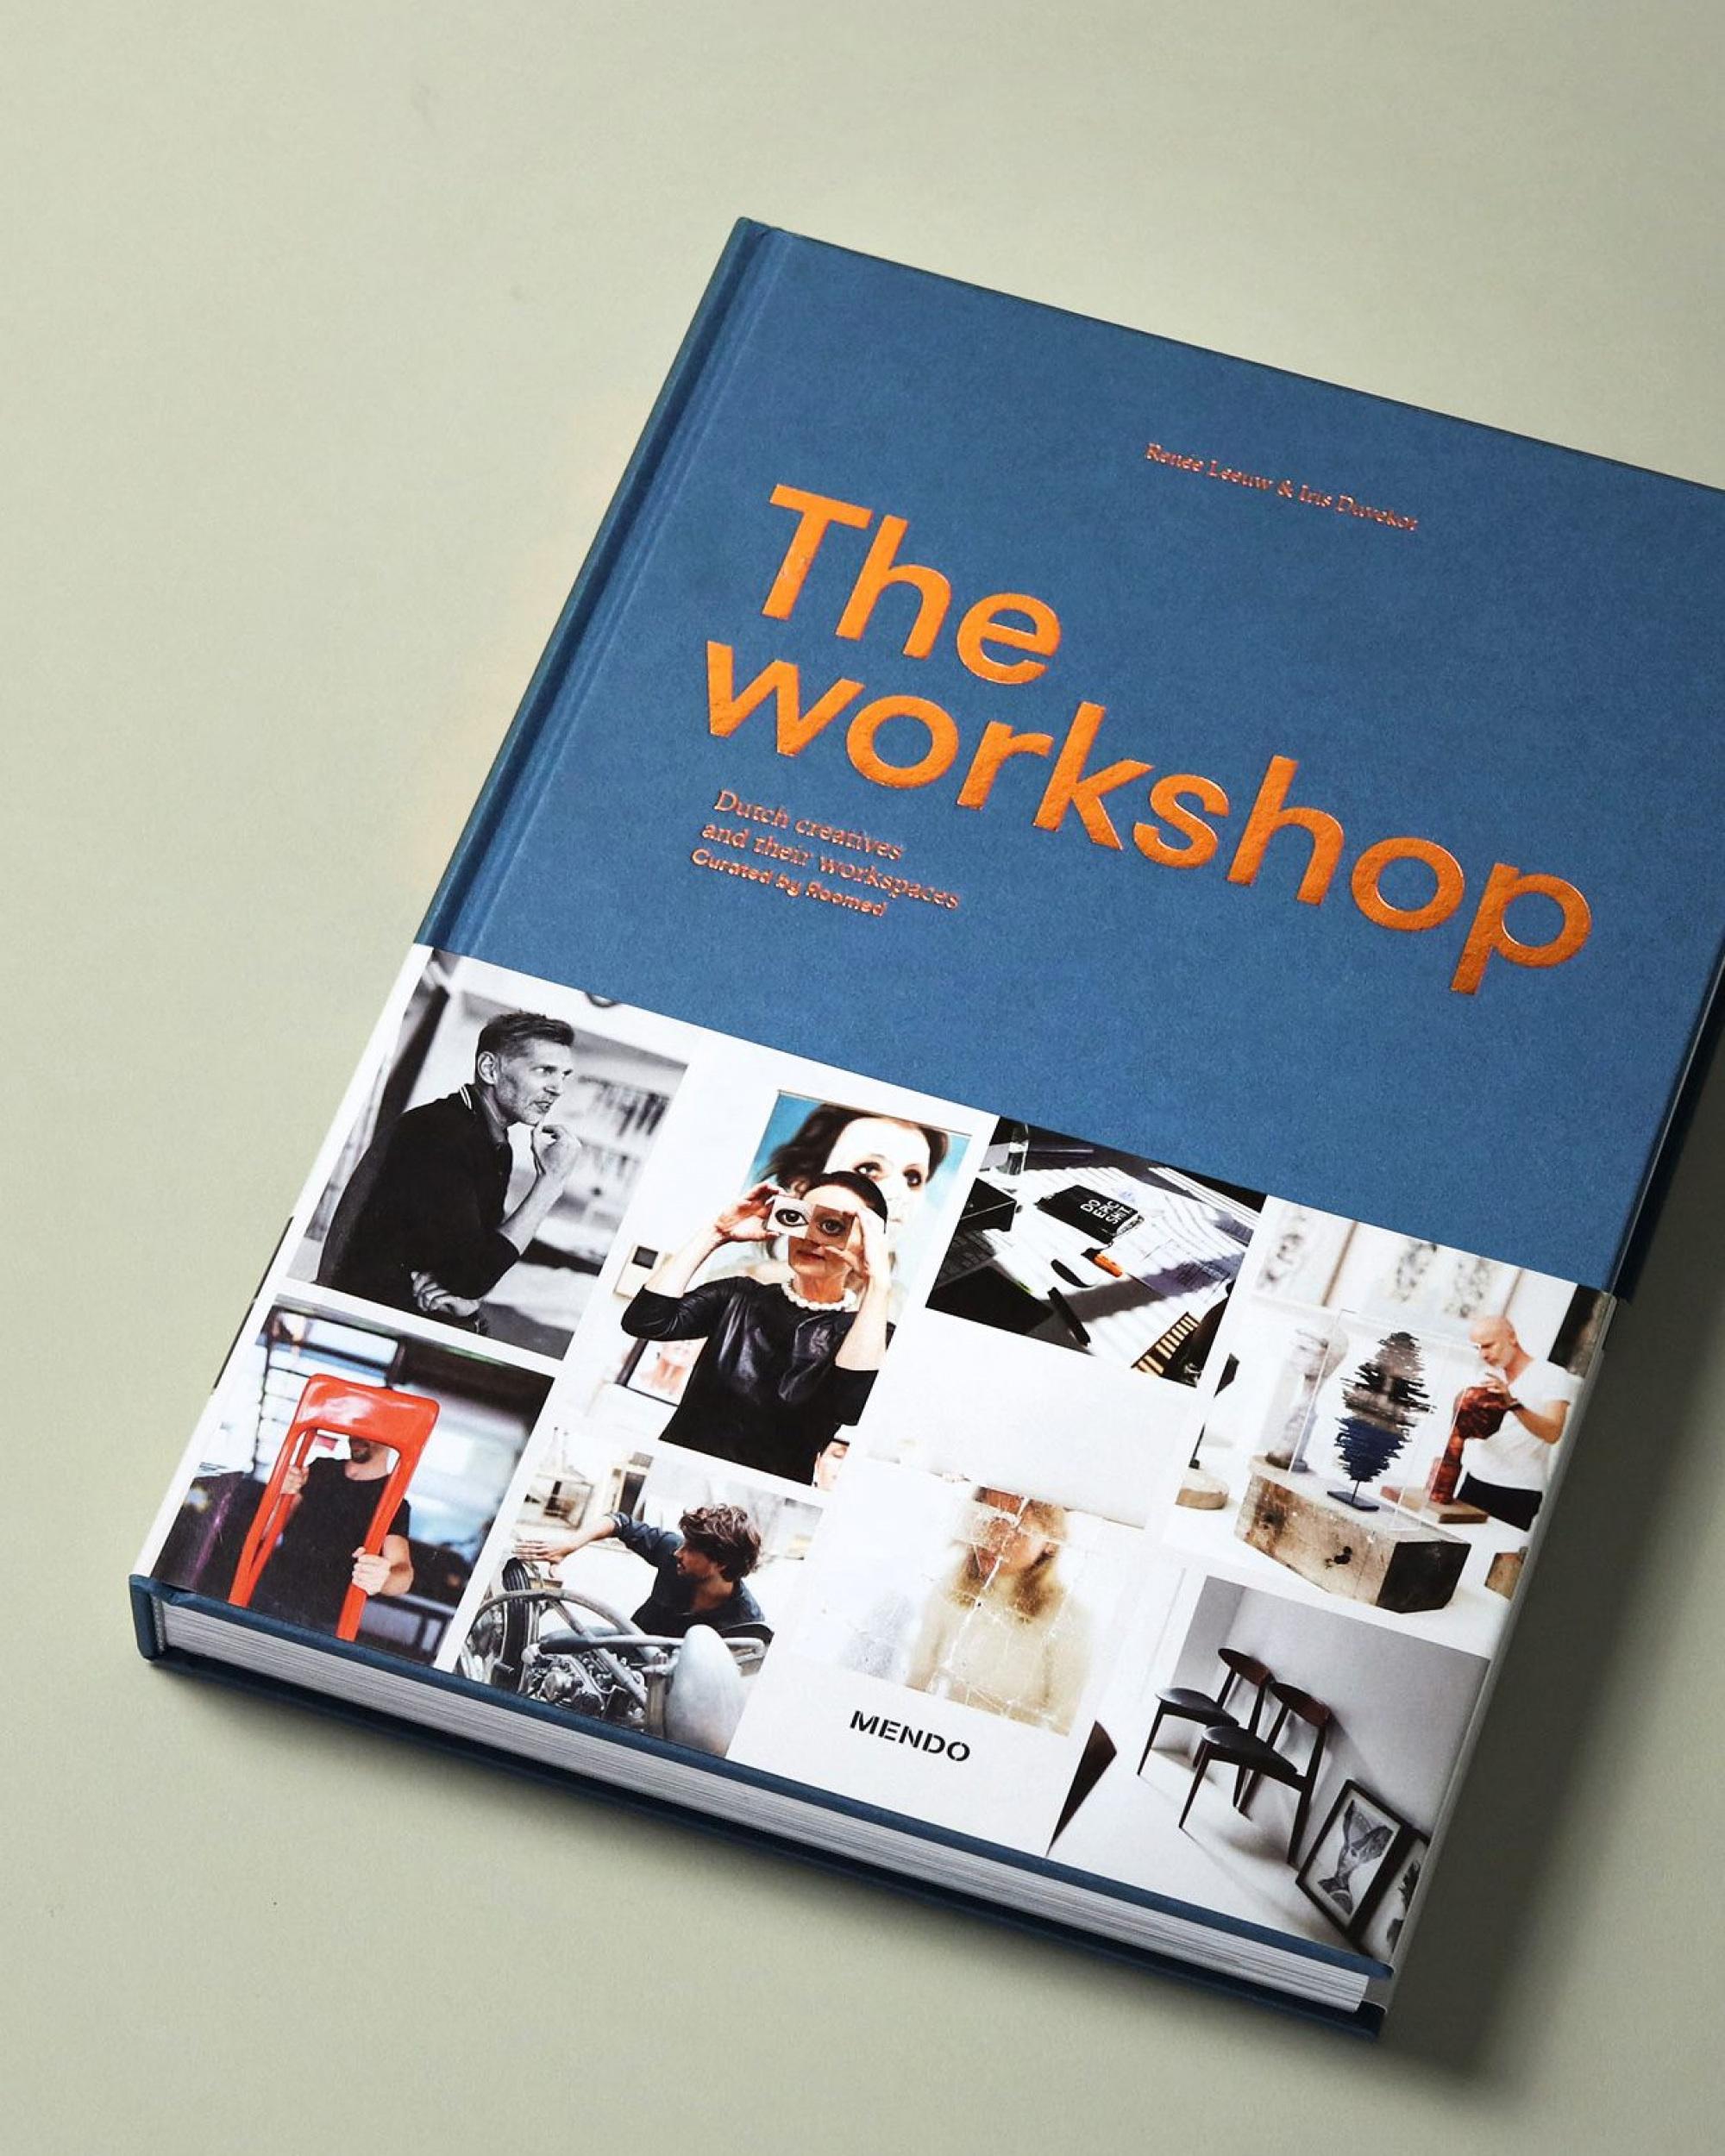 The-Workshop-Buitenkant-Staand-omslag_v2-e1492085663720-2000x2500-c-default.jpg